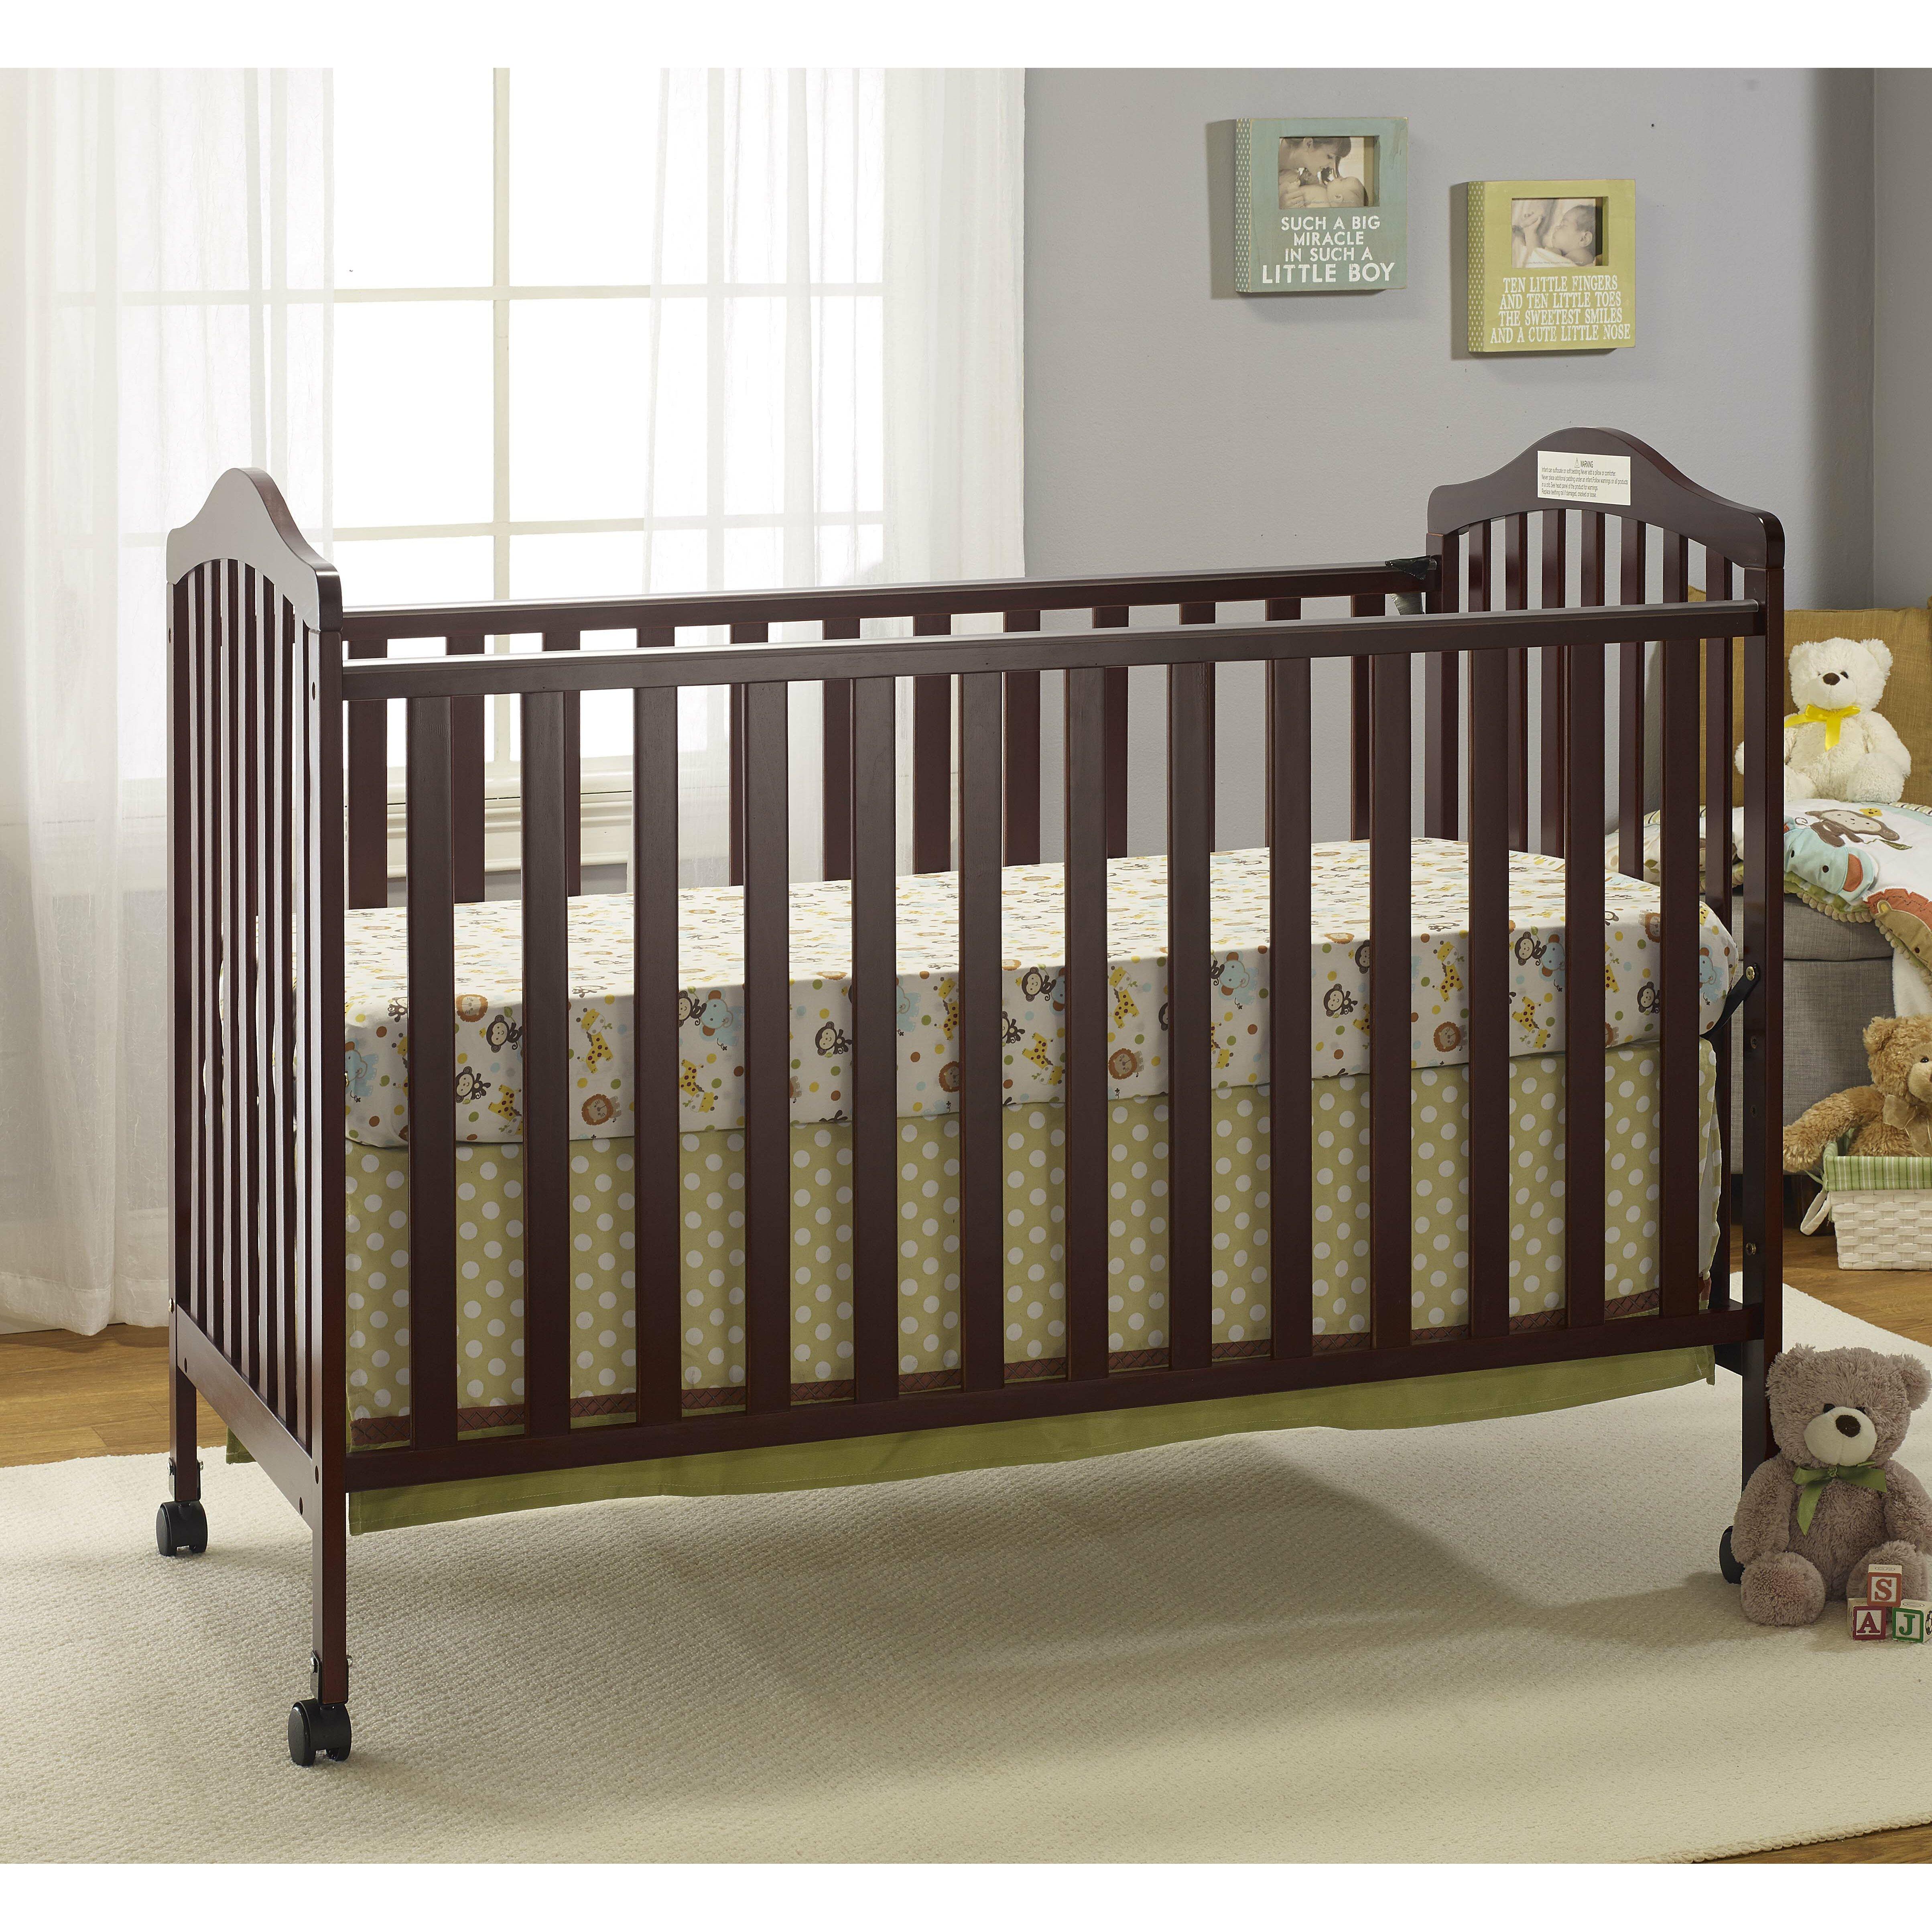 Crib for sale sheffield - Emily Crib